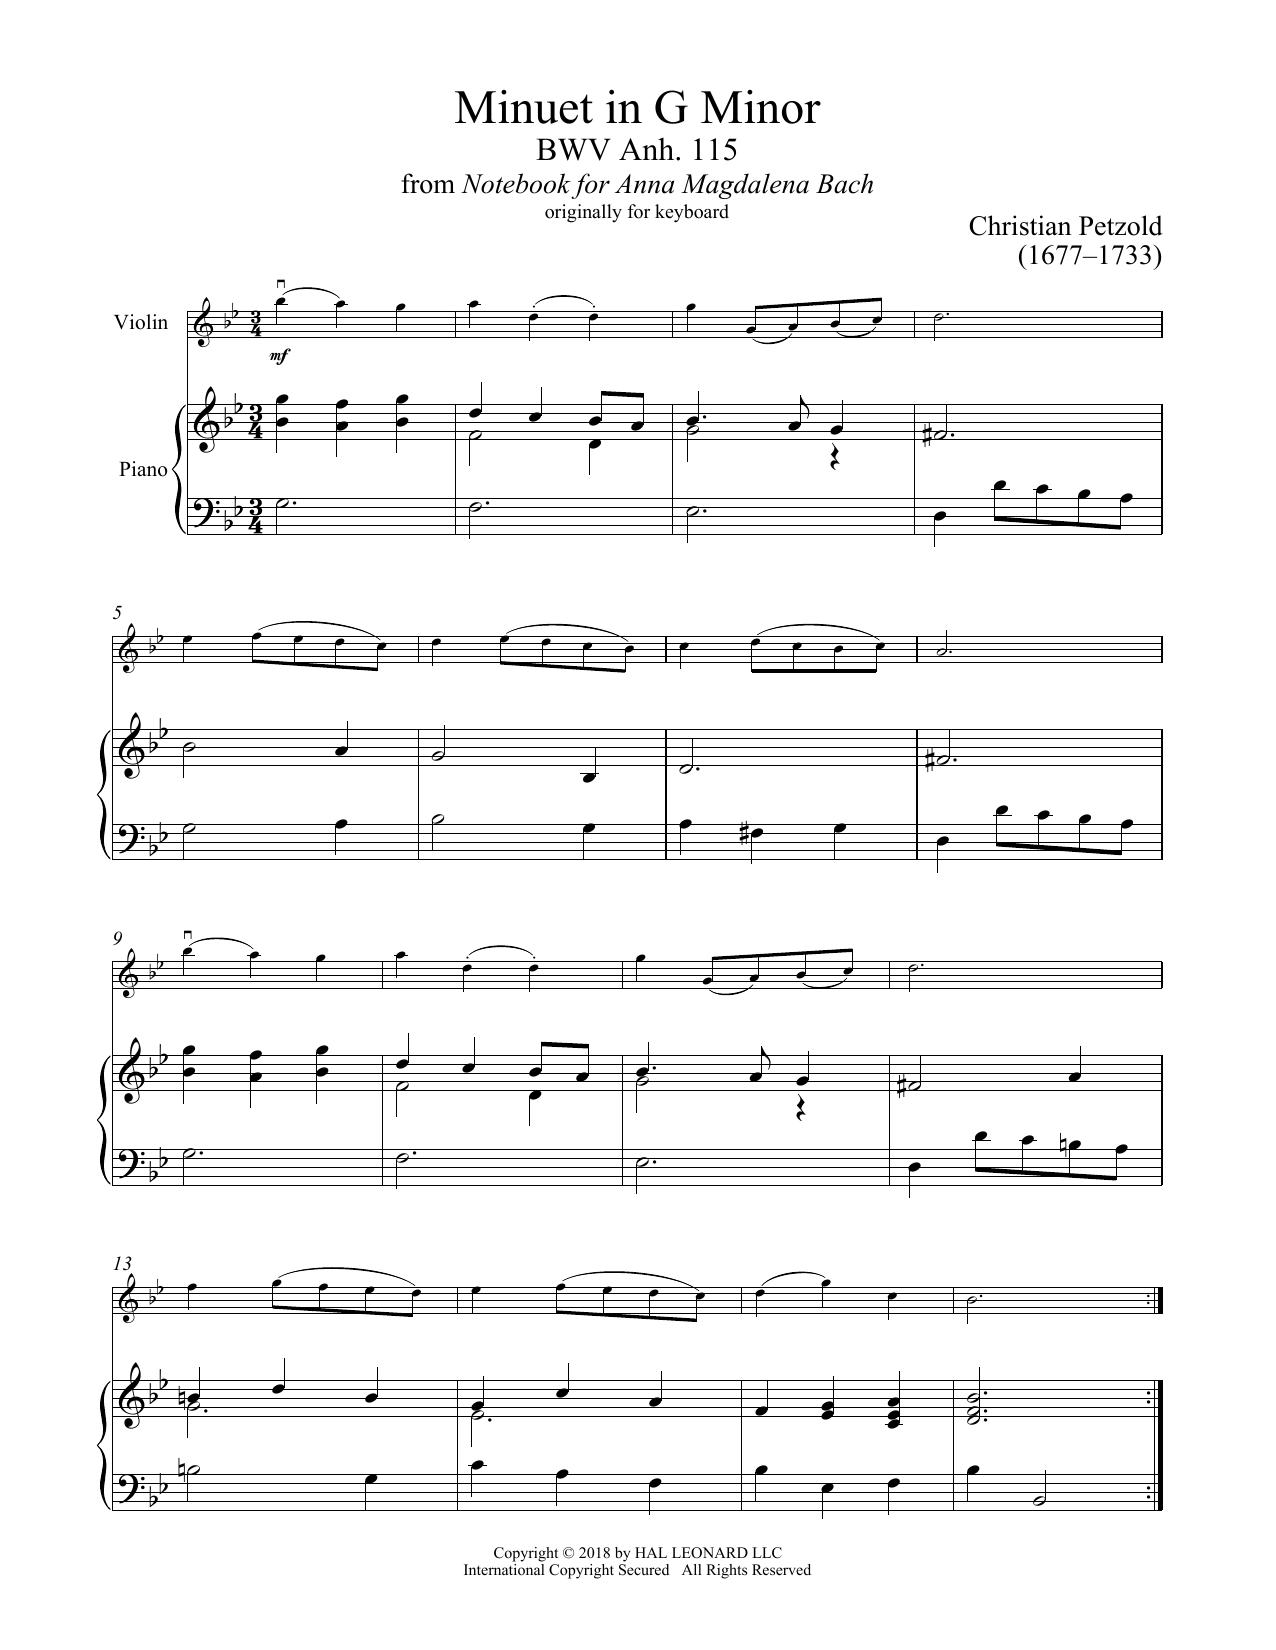 Christian Petzold Minuet In G Minor Bwv Anh 115 Sheet Music Notes Chords Download Printable Violin And Piano Sku 407627